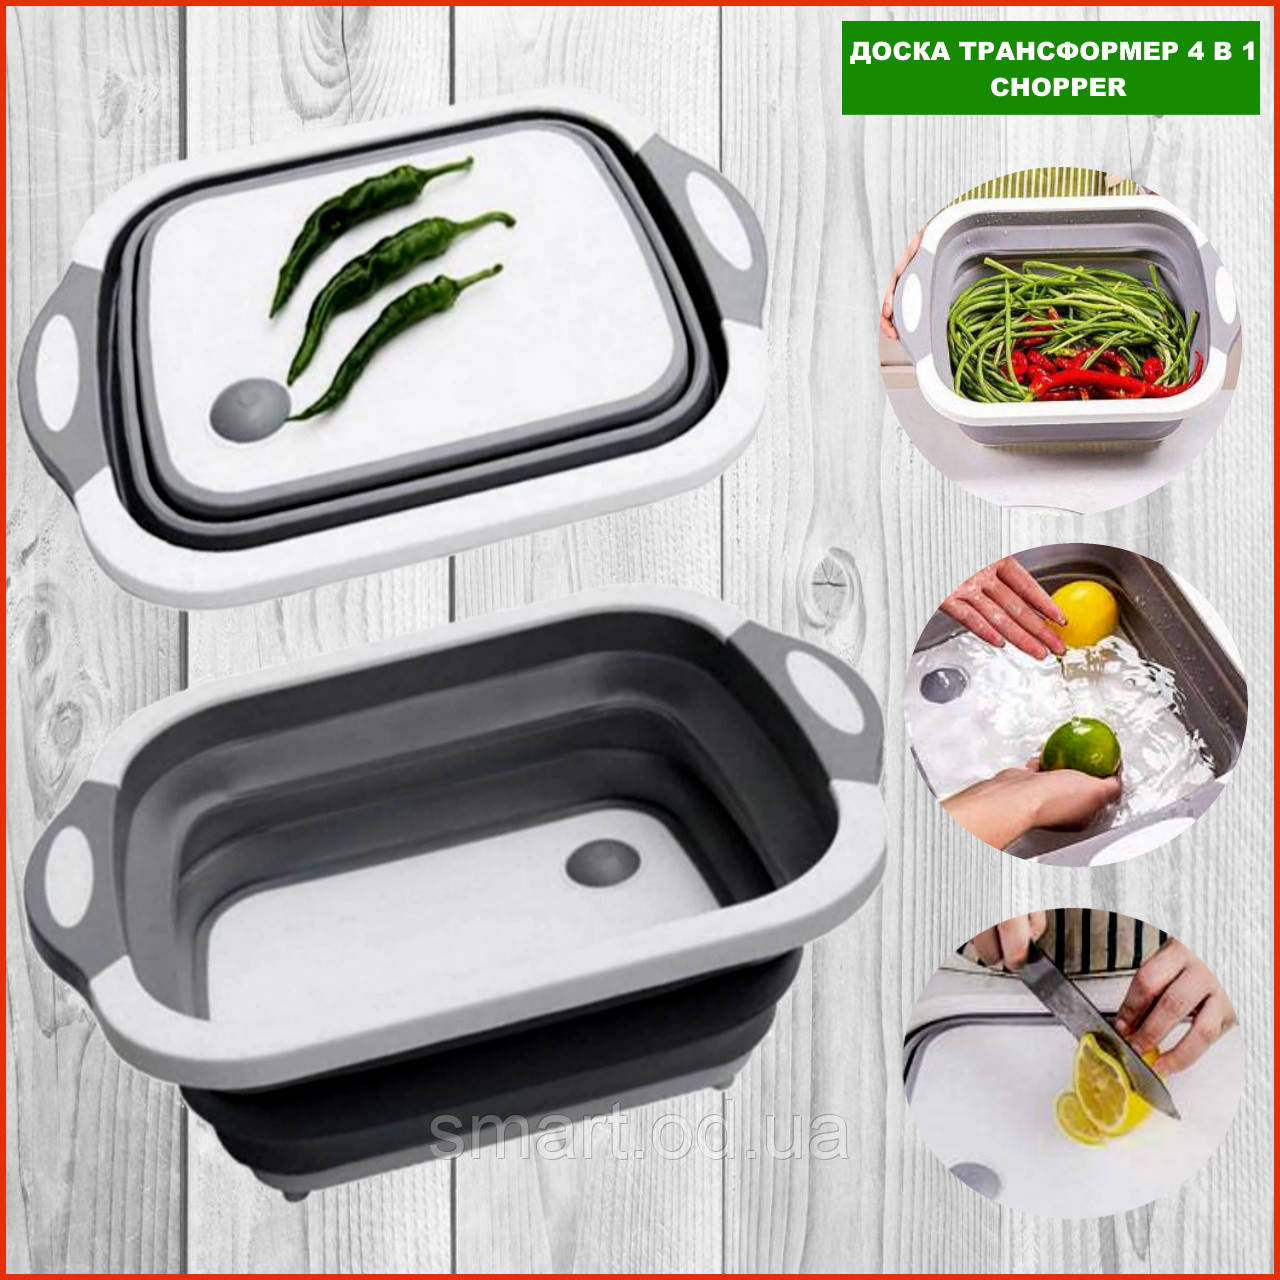 Дошка обробна 4 в 1, дошка обробна складна, миска дошка, дошка для кухні, дошка трансформер